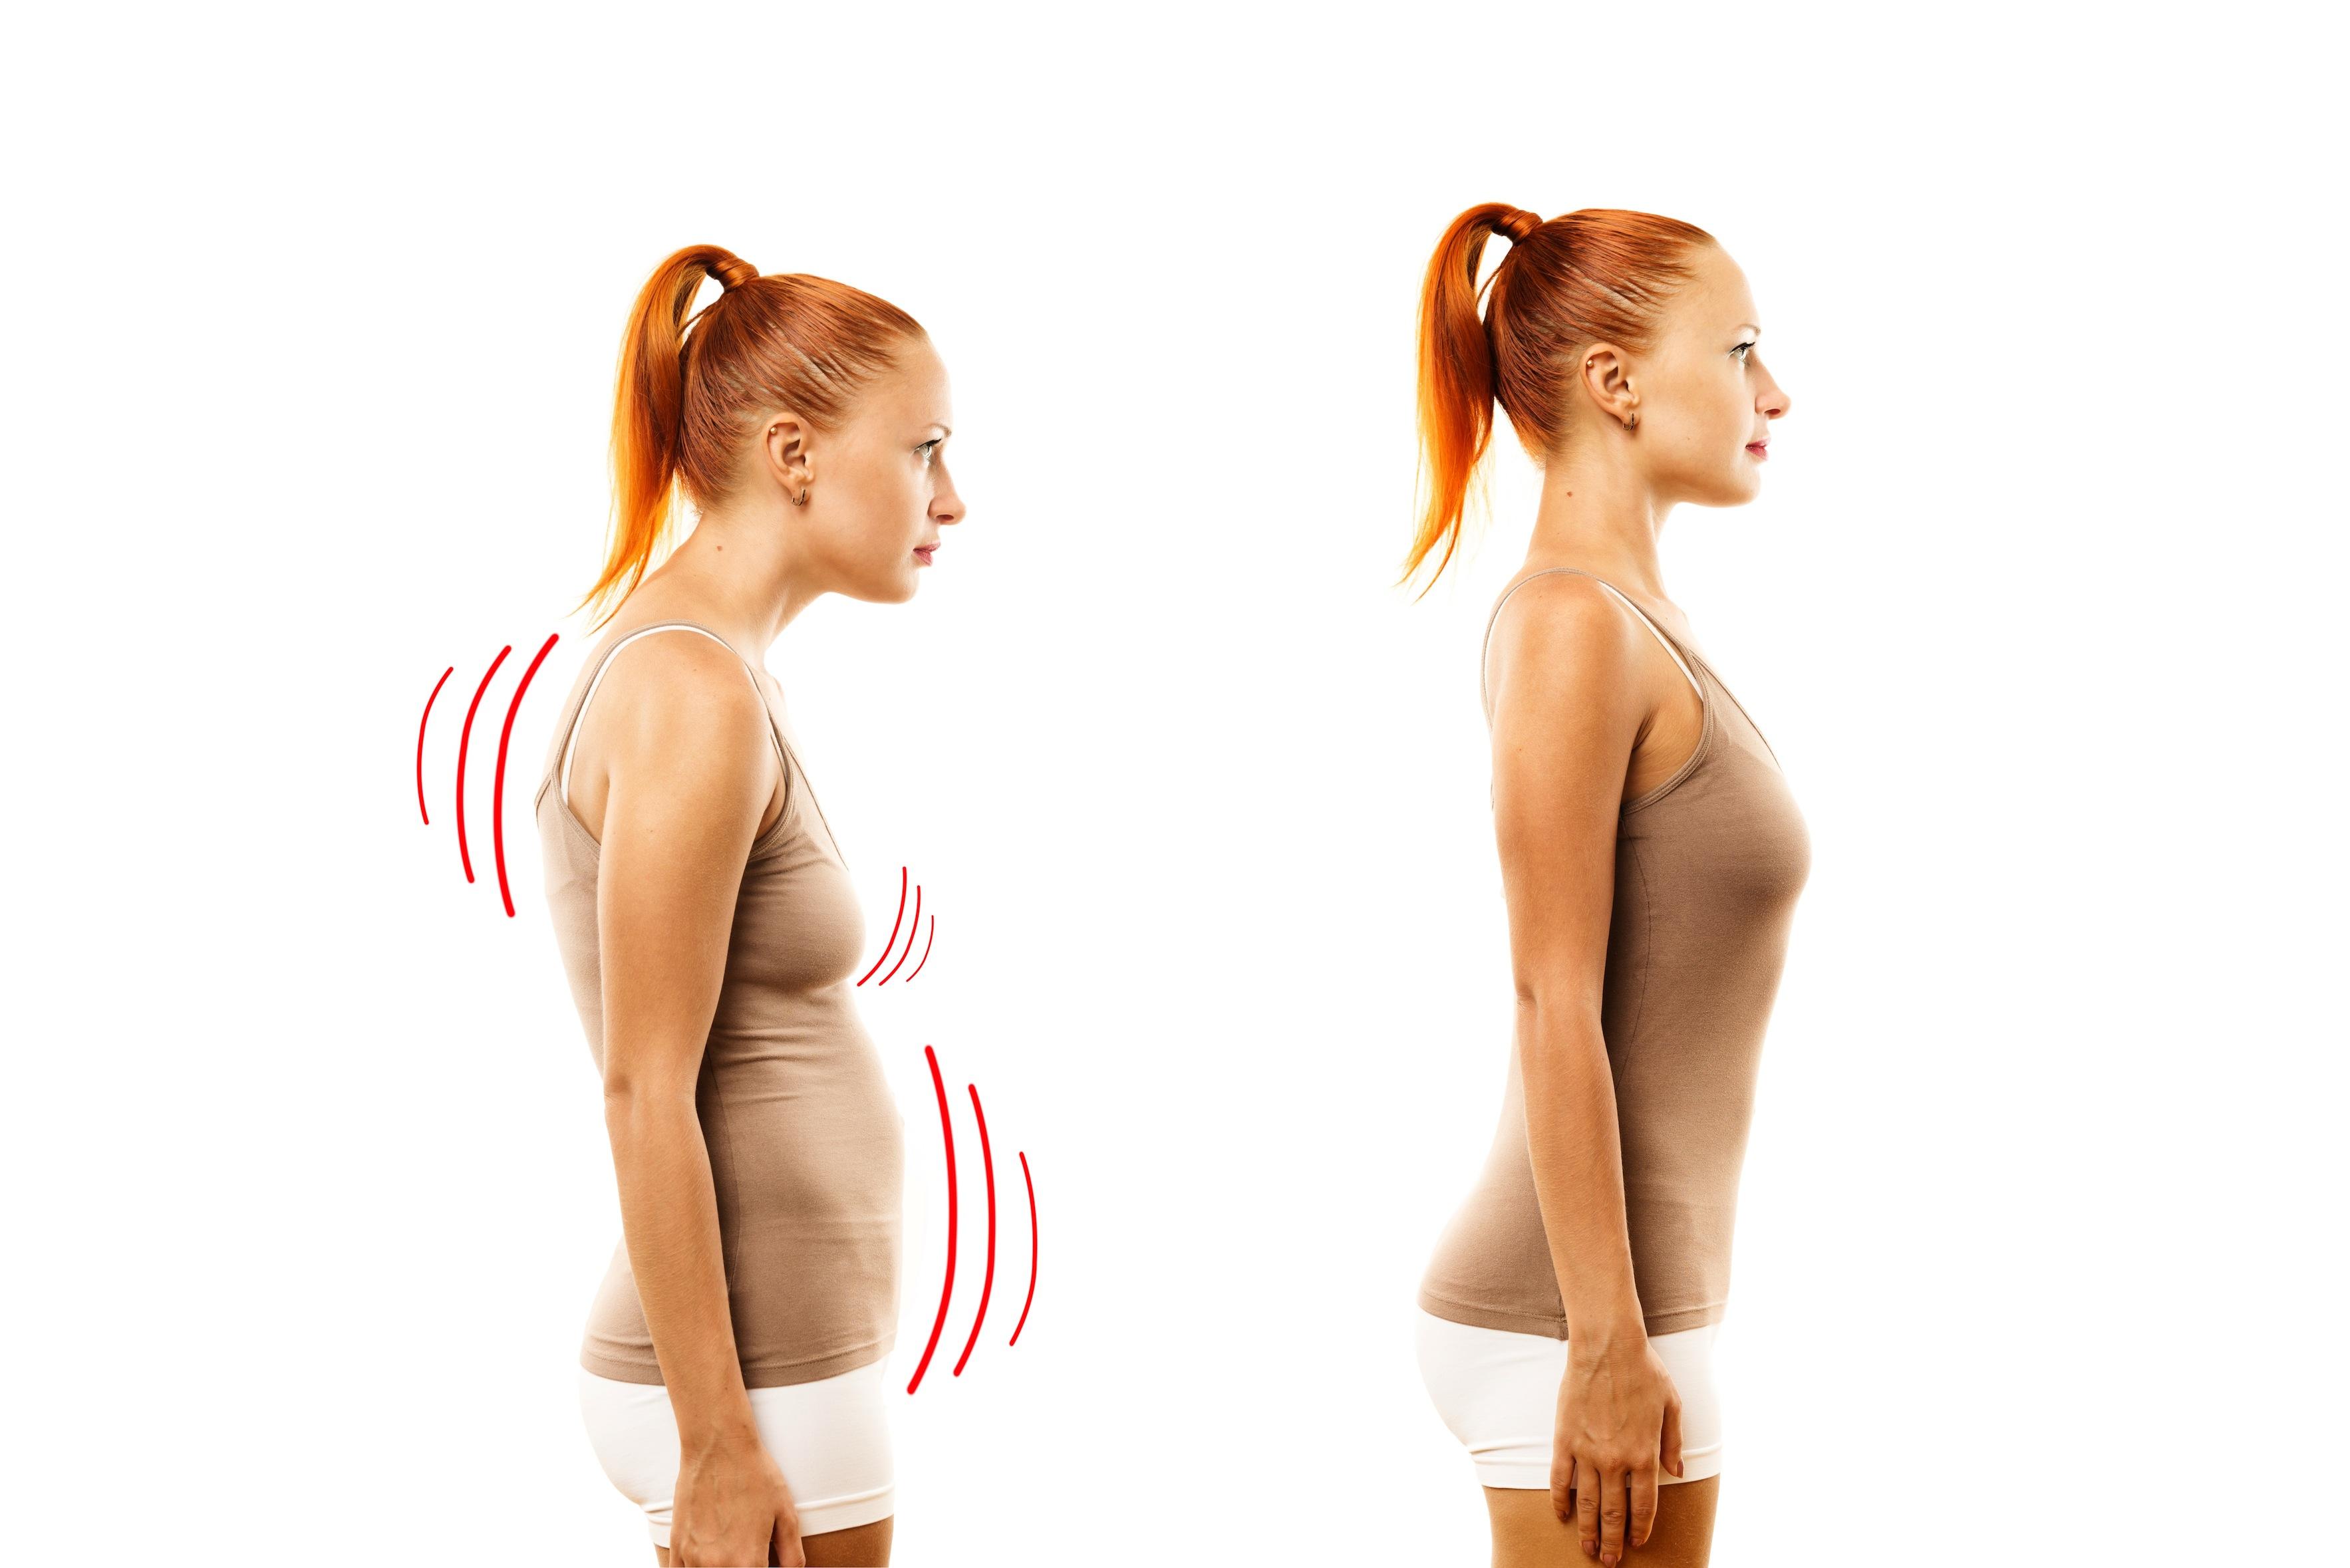 Posture-renforcement-BPJEPS-AGFF-BP2